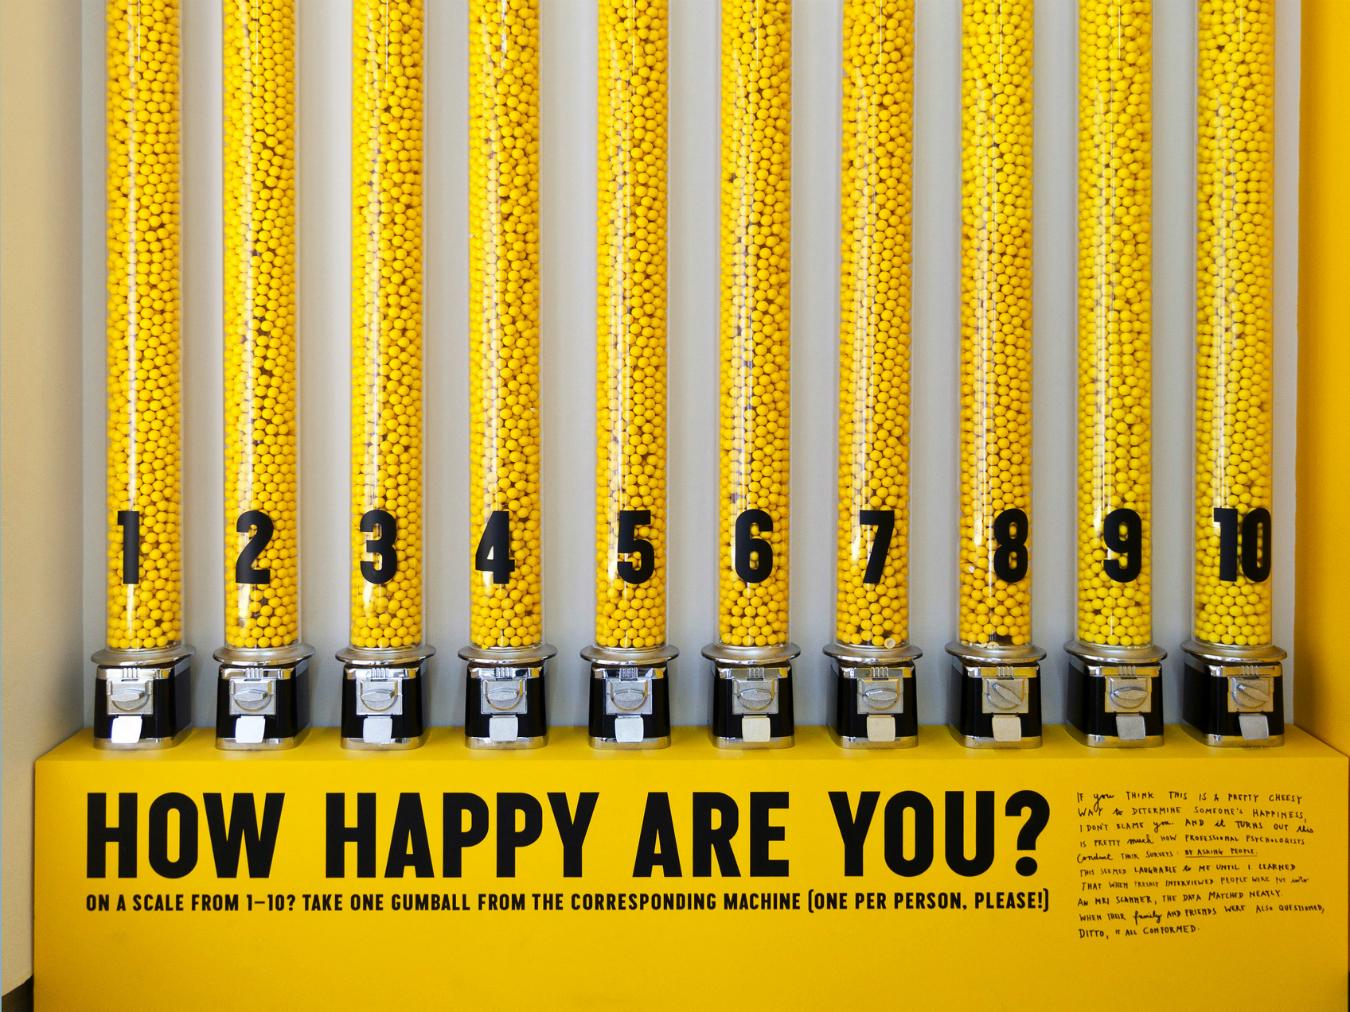 MONTECRISTO Blog: Stefan Sagmeister's The Happy Show